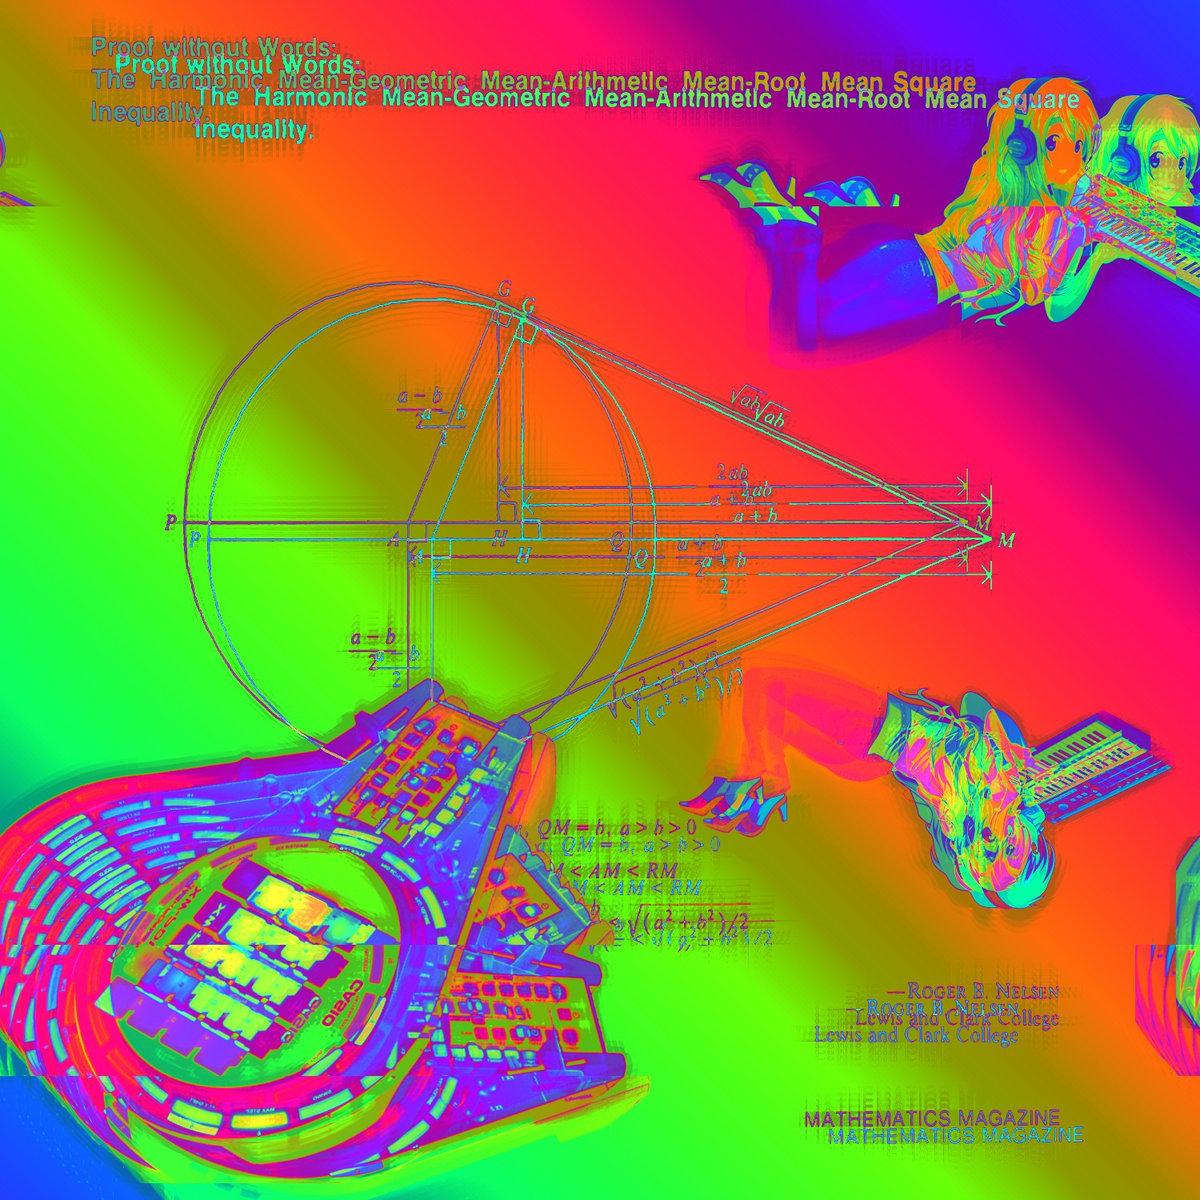 Gec 40 Ü Original 40 gecs remix by Danny L Harle